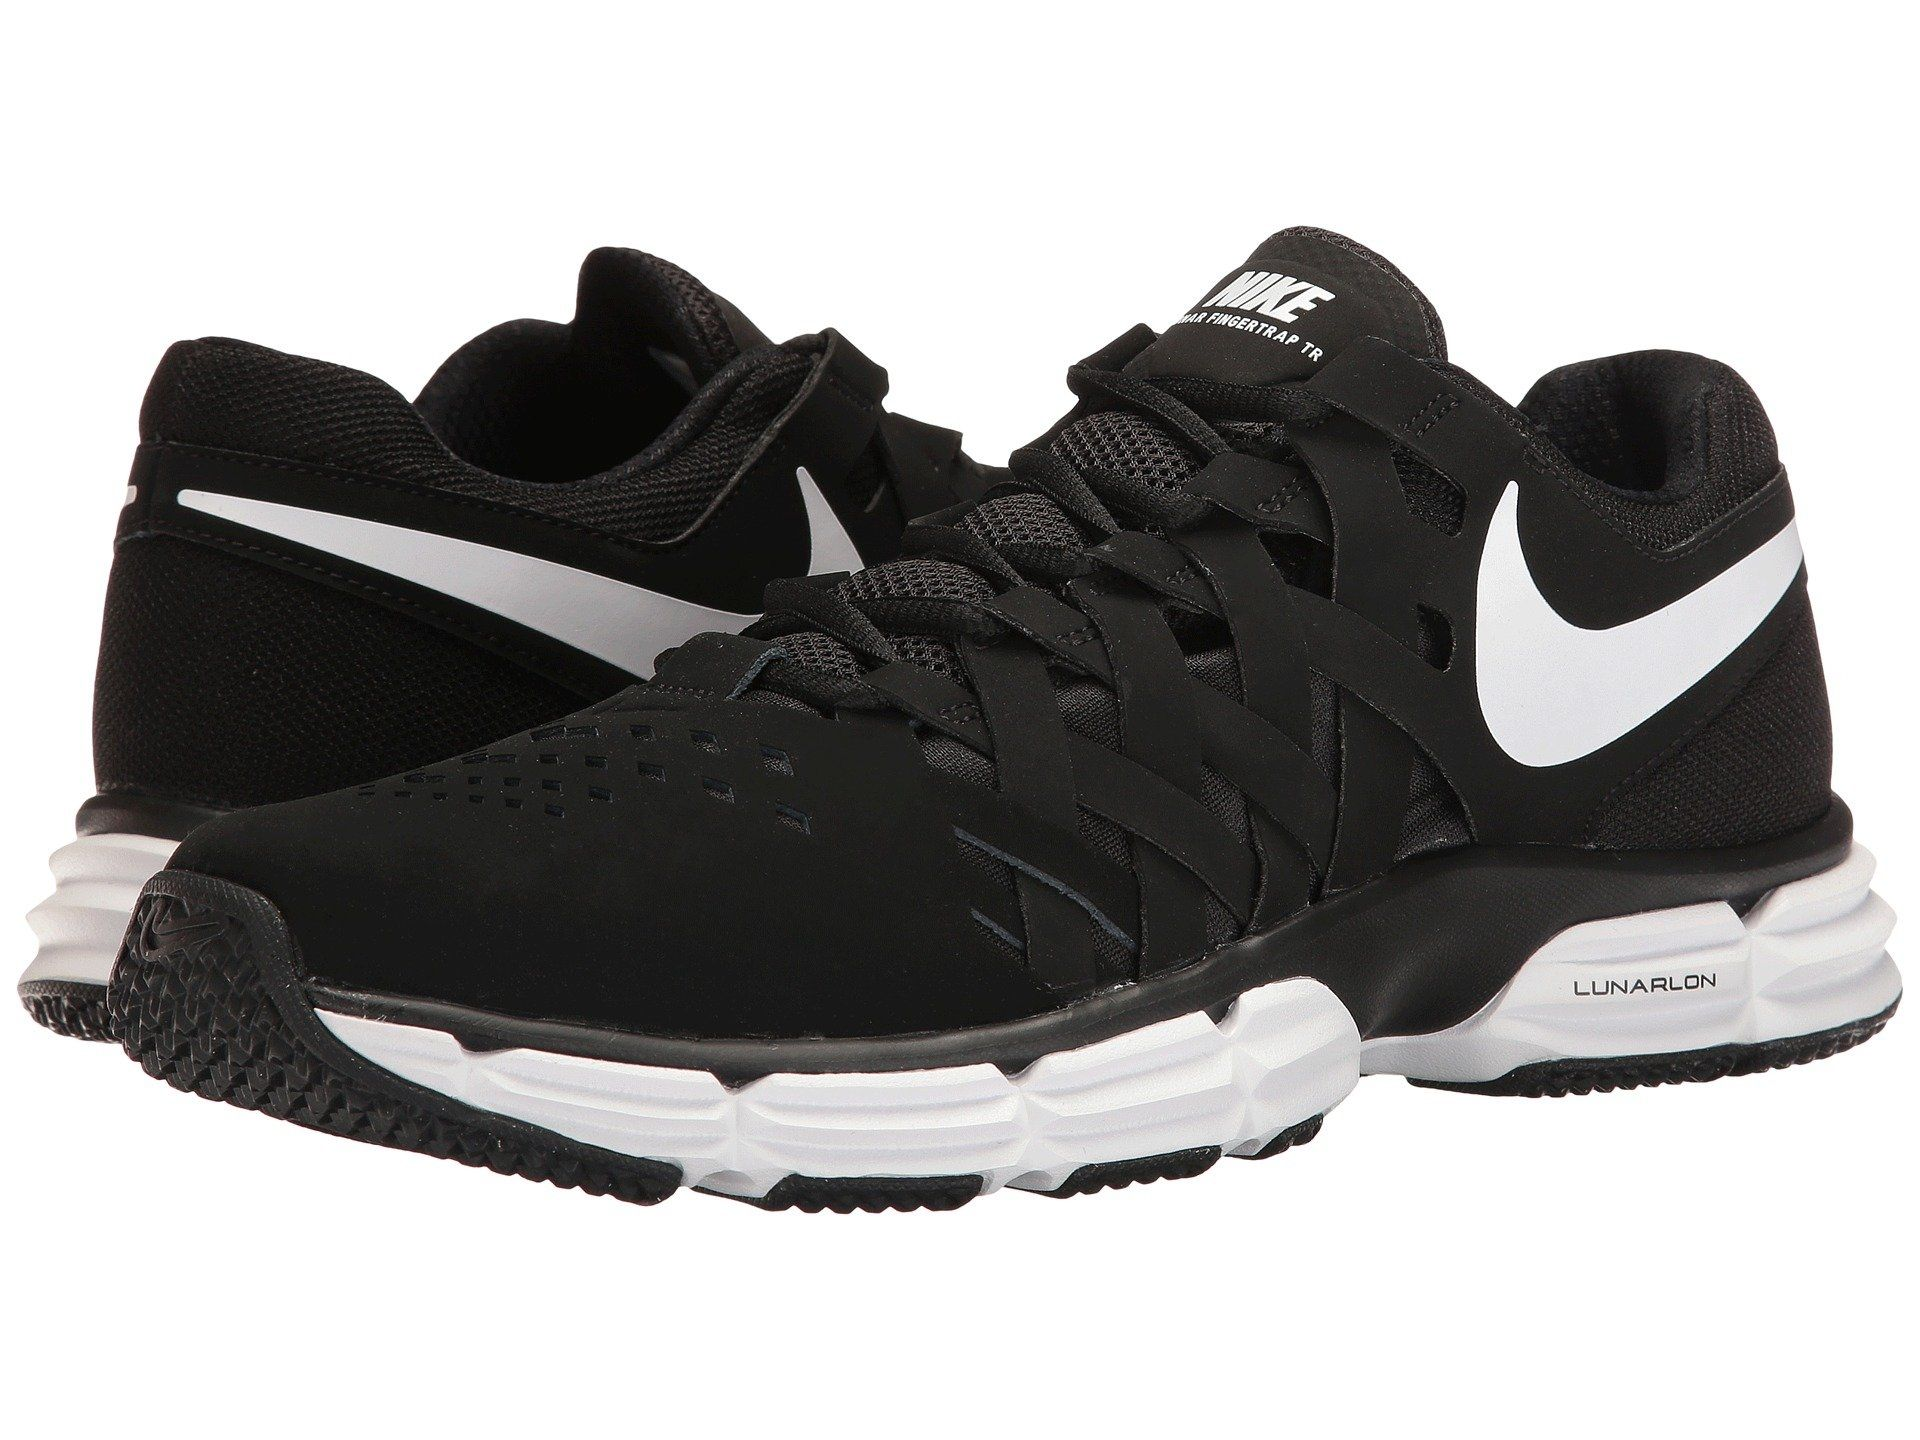 huge selection of 0ad86 3270e Nike Nike Lunar Fingertrap TR. 1,700 EGP